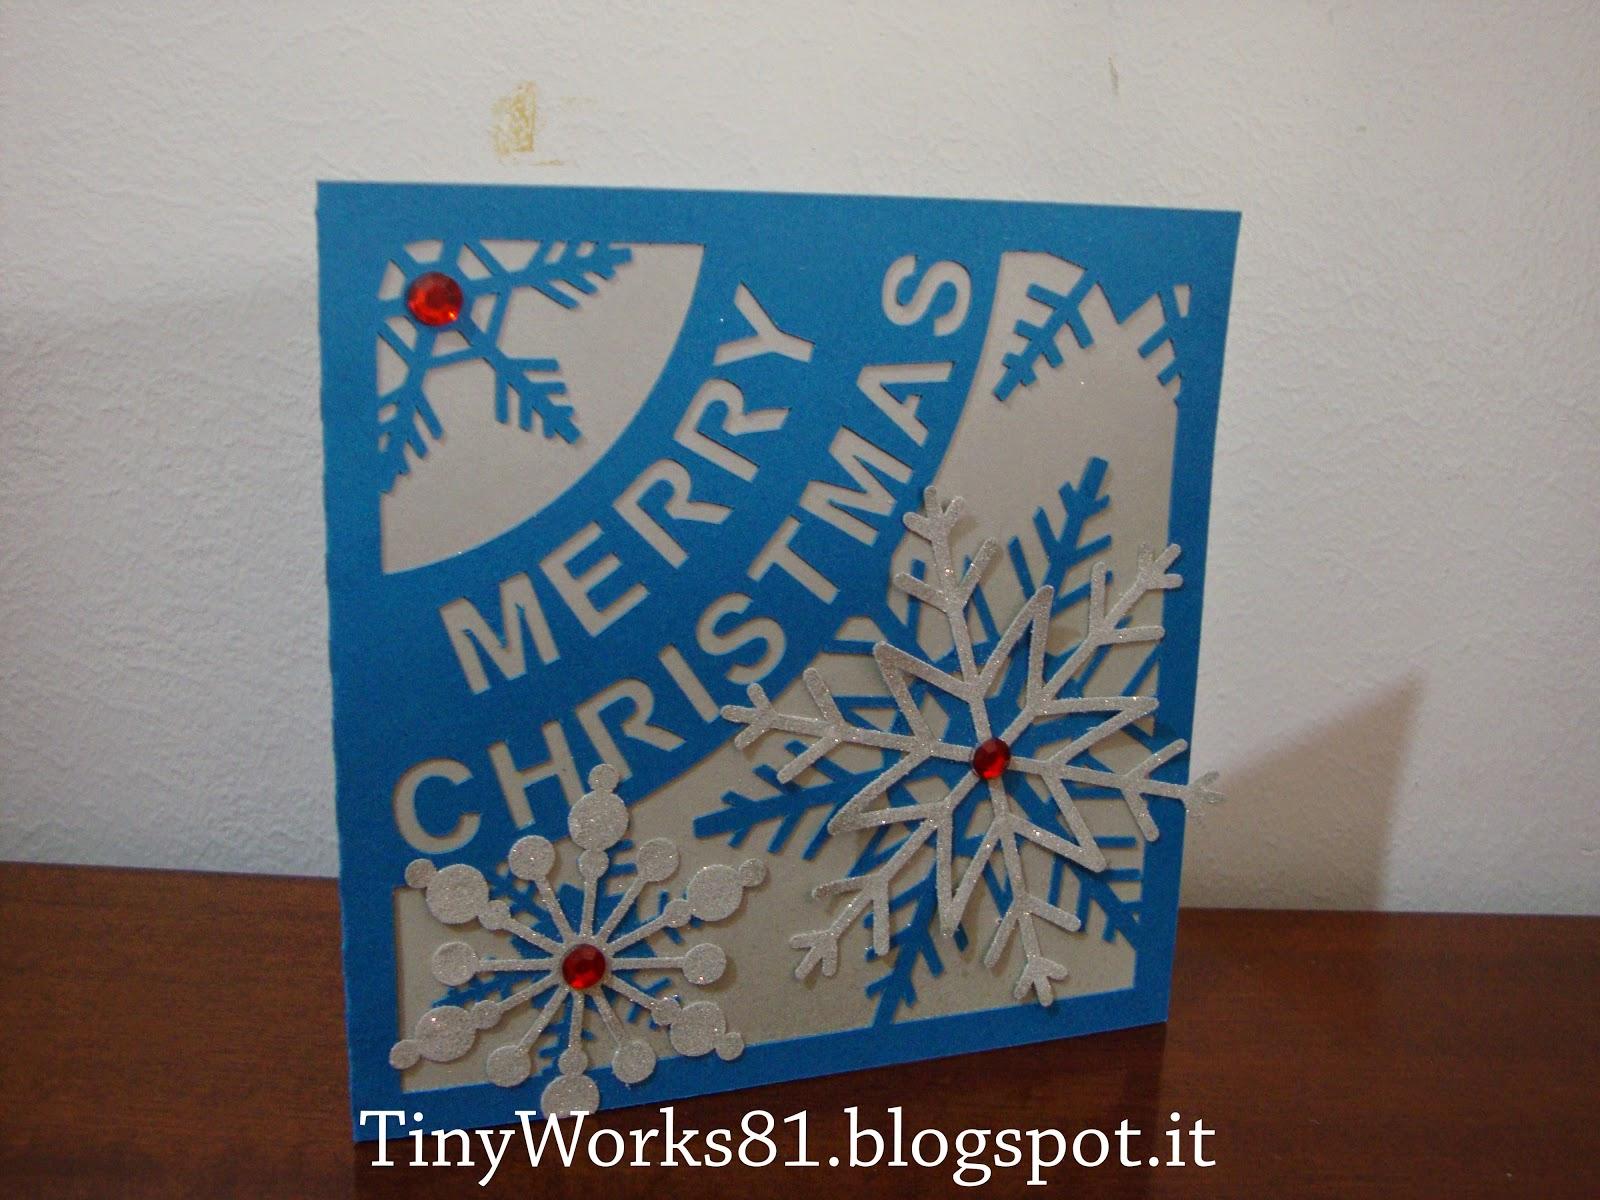 http://tinyworks81.blogspot.it/